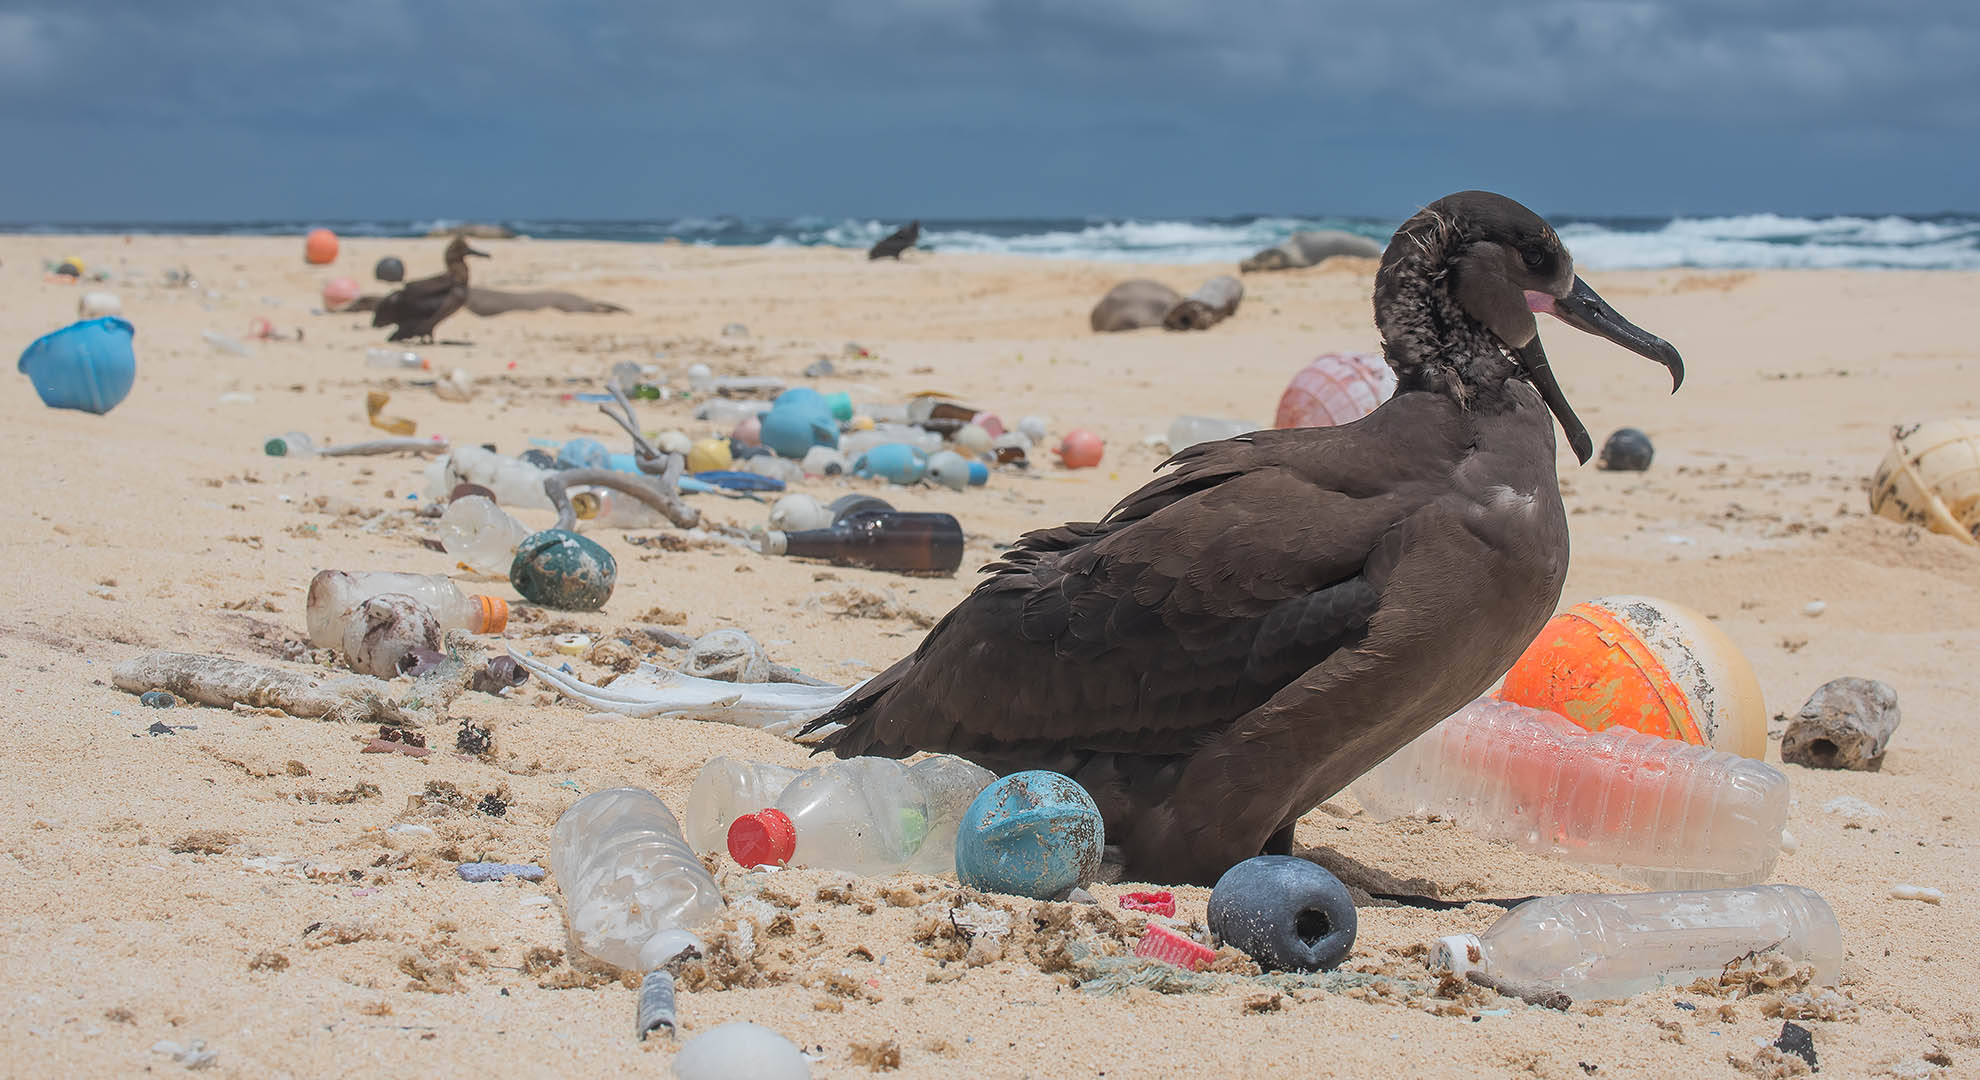 Bird in a garbage island